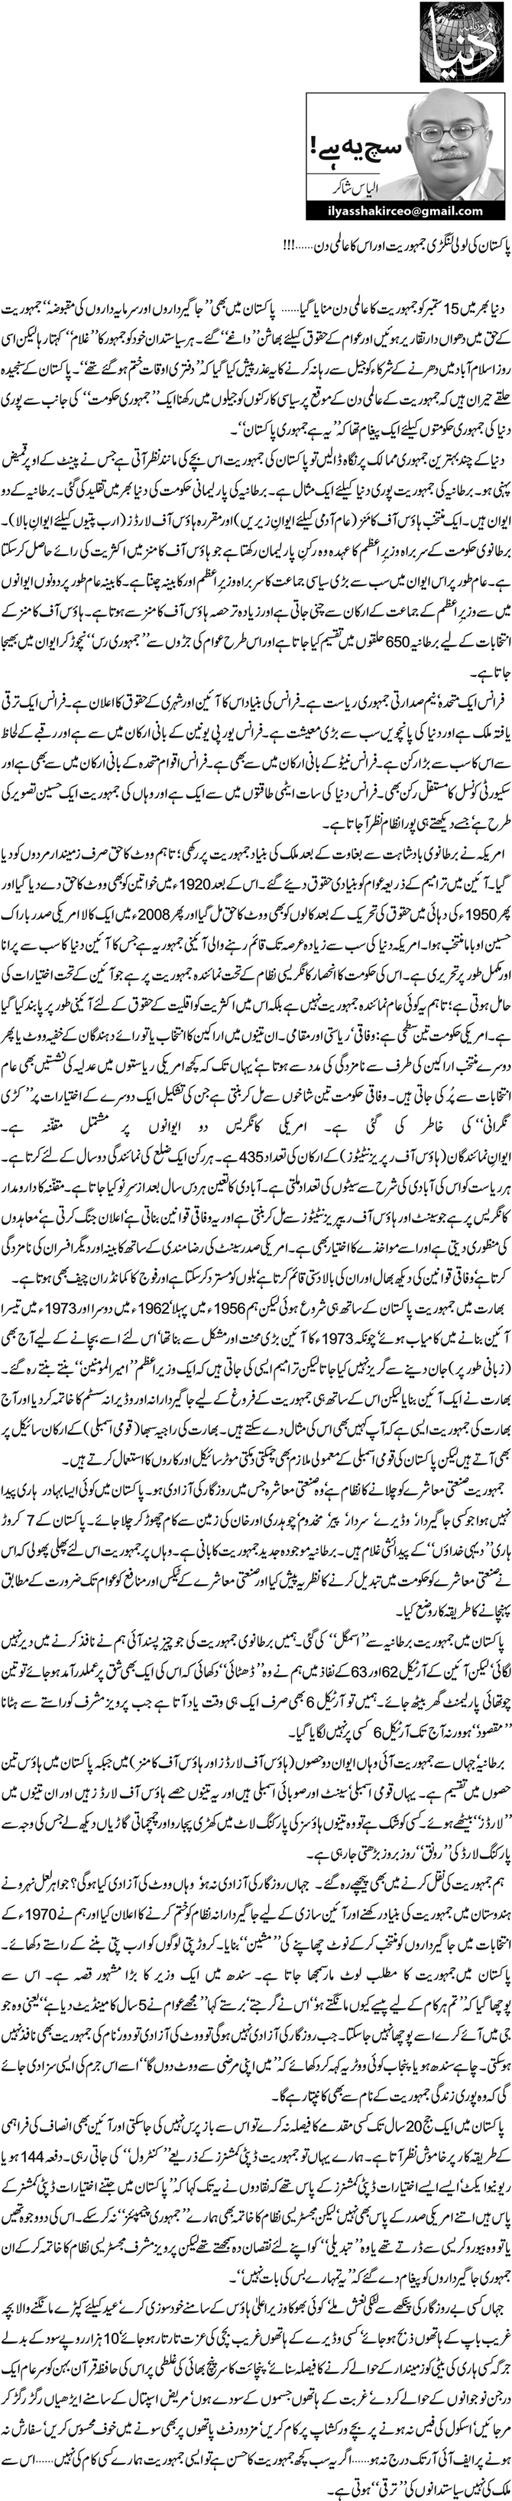 Print Media Coverage Daily Dunya - Ilyas Shakir